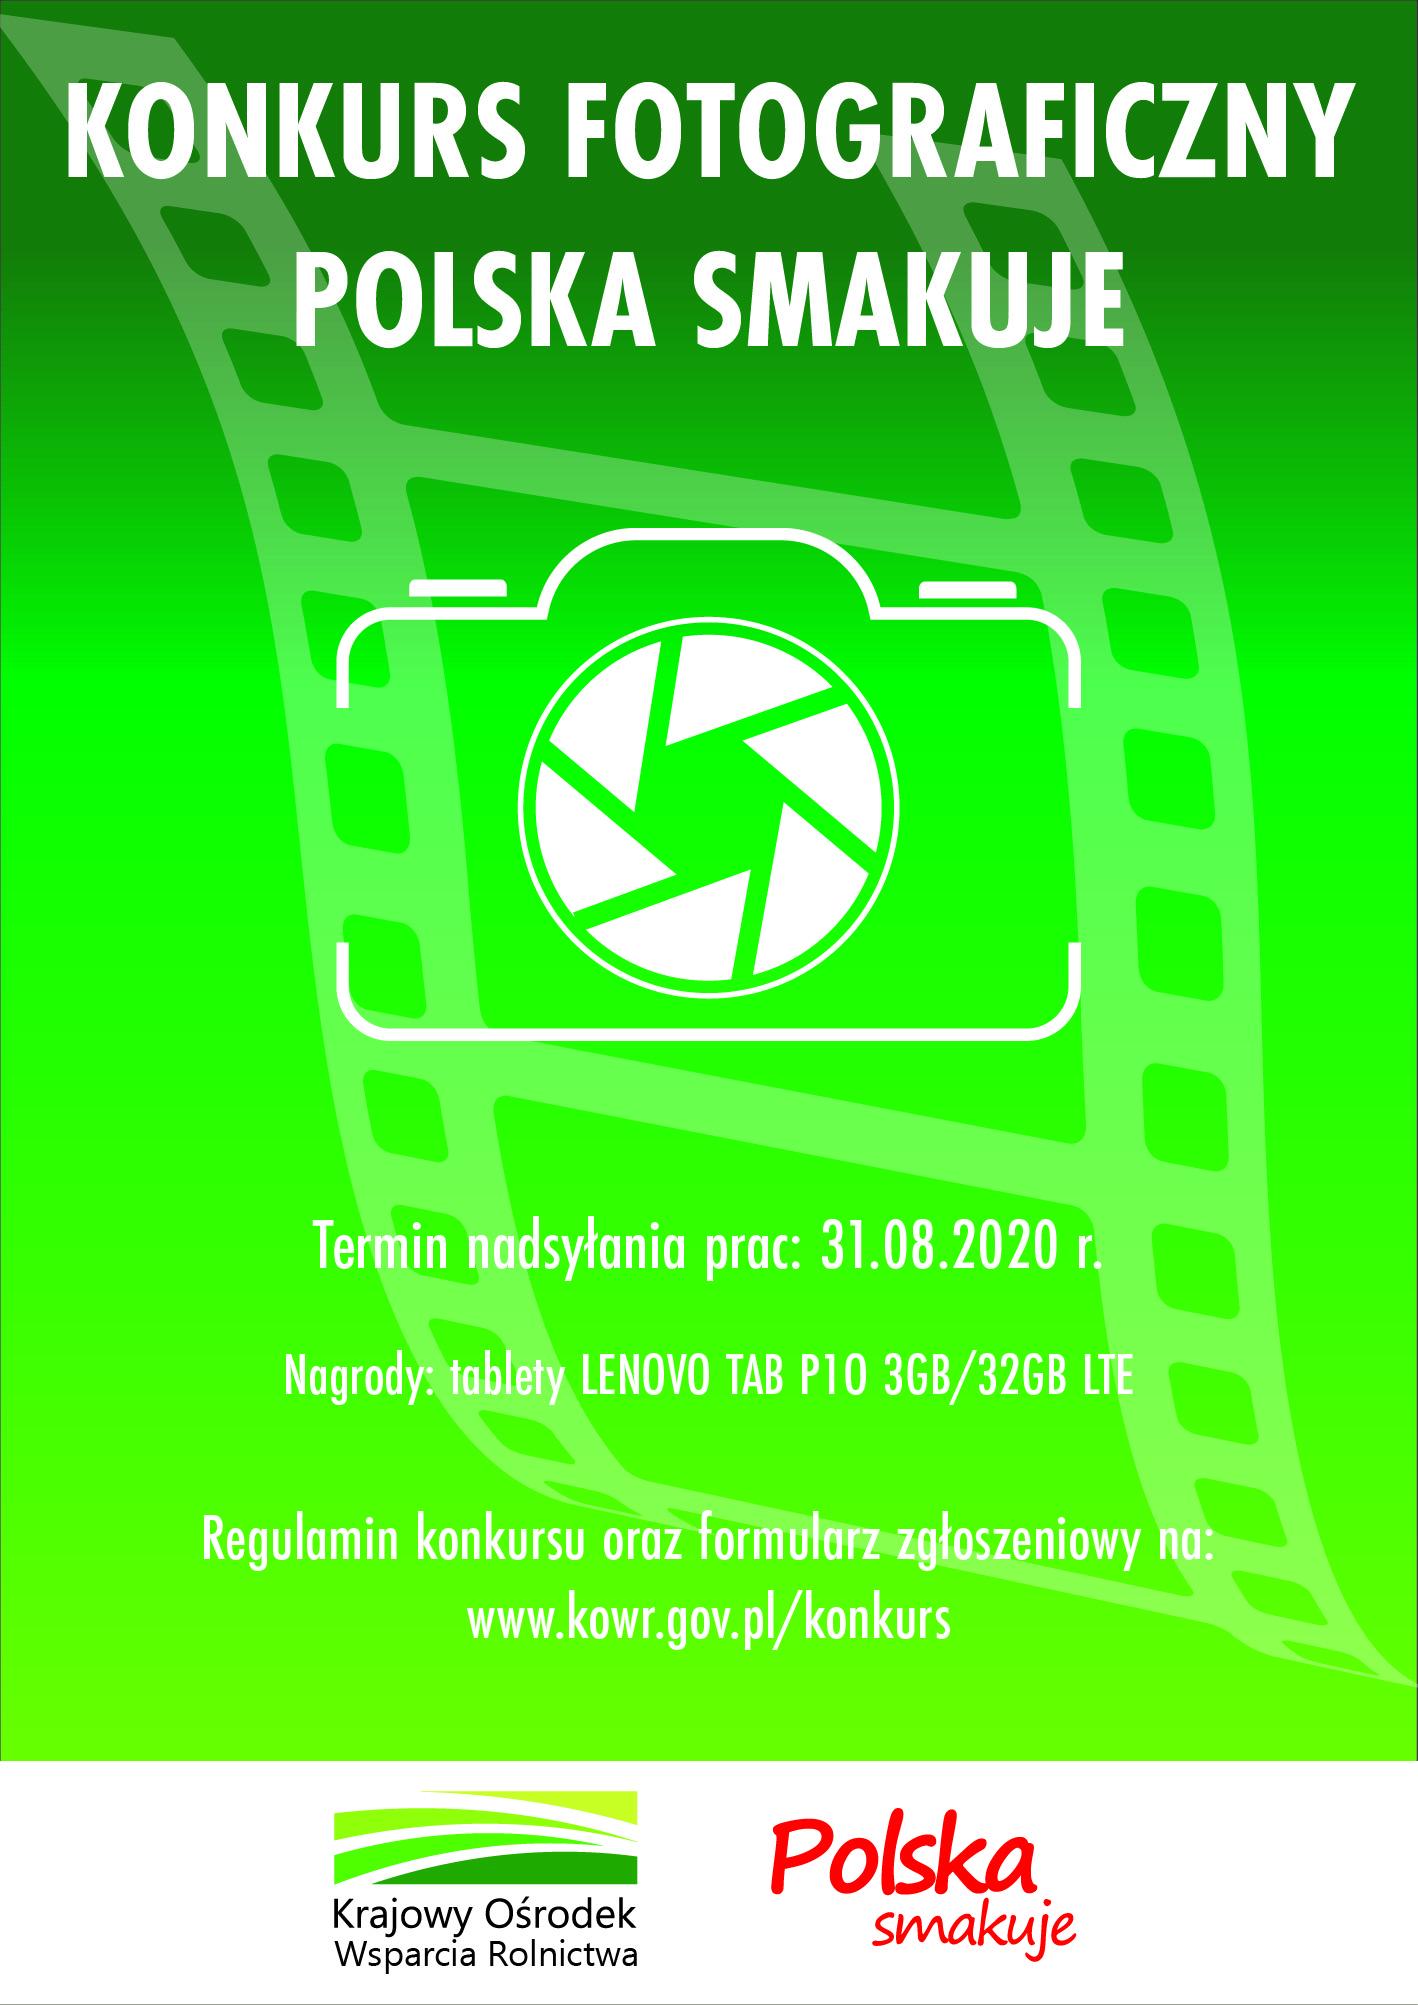 "Konkurs fotograficzny ,,Polska Smakuje"""